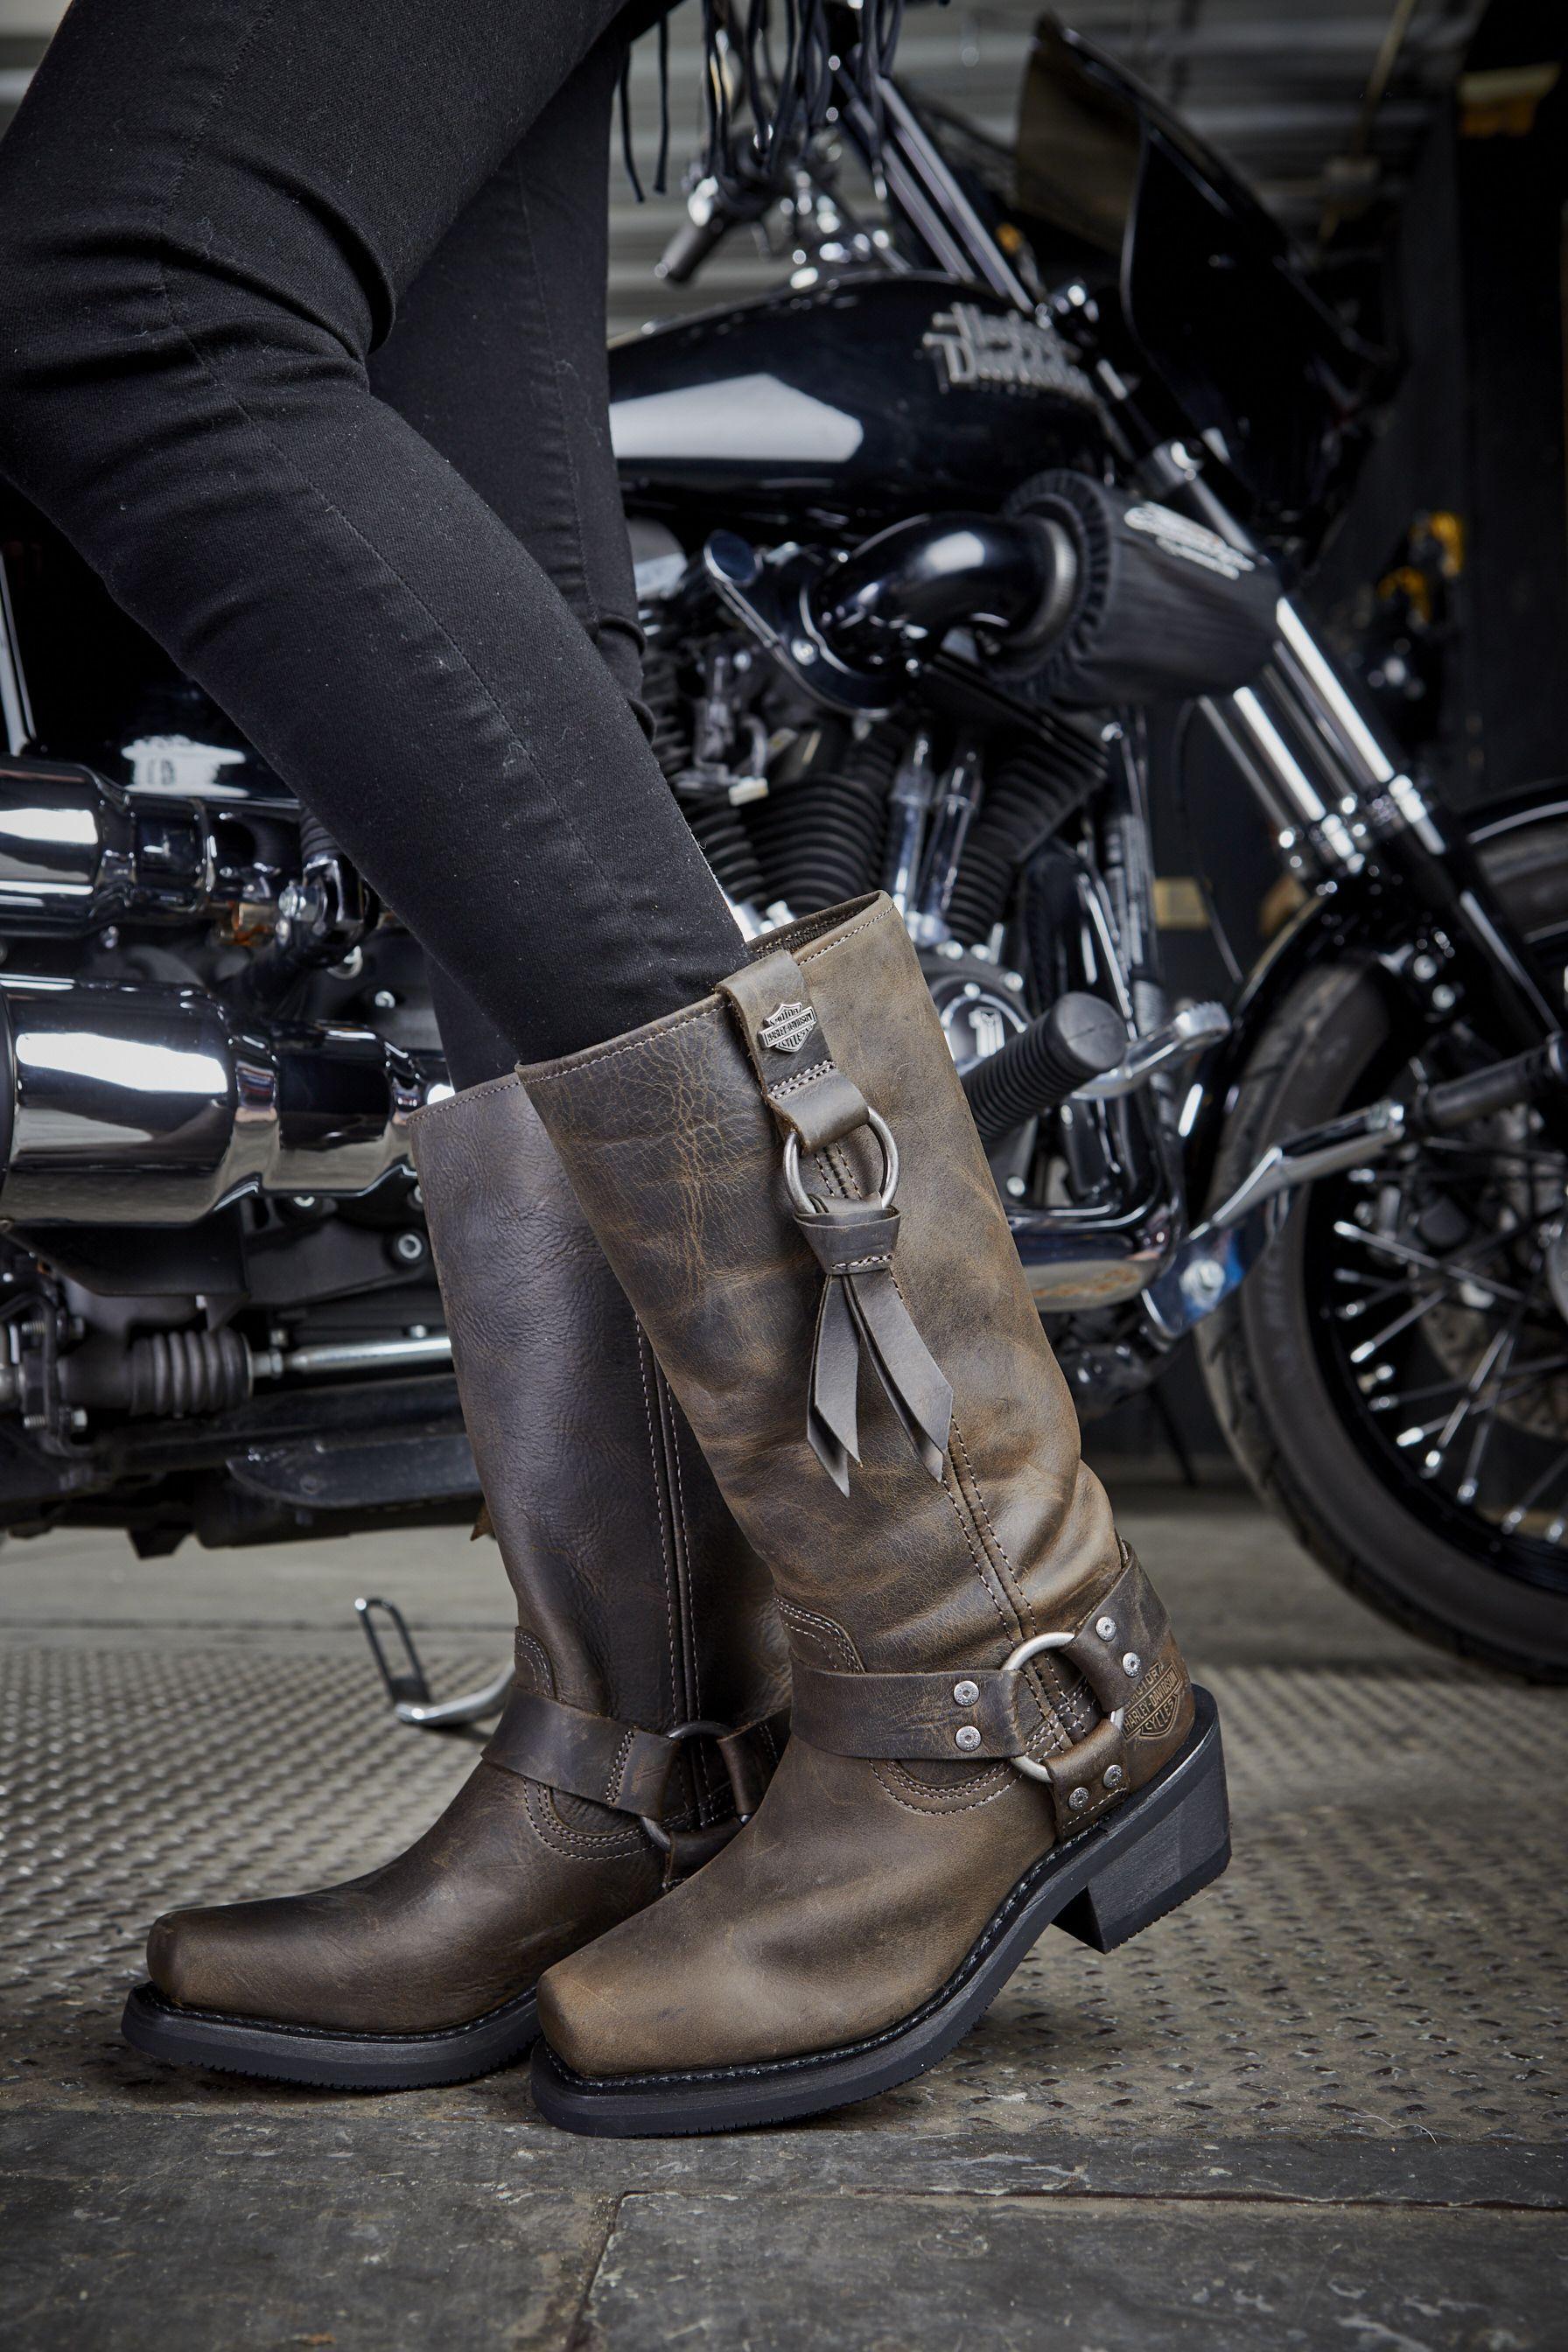 9c295c52fd9d8 Women's Fenmore Boot | ❤Boots! Boots! Boots!❤ | Women's motorcycle ...